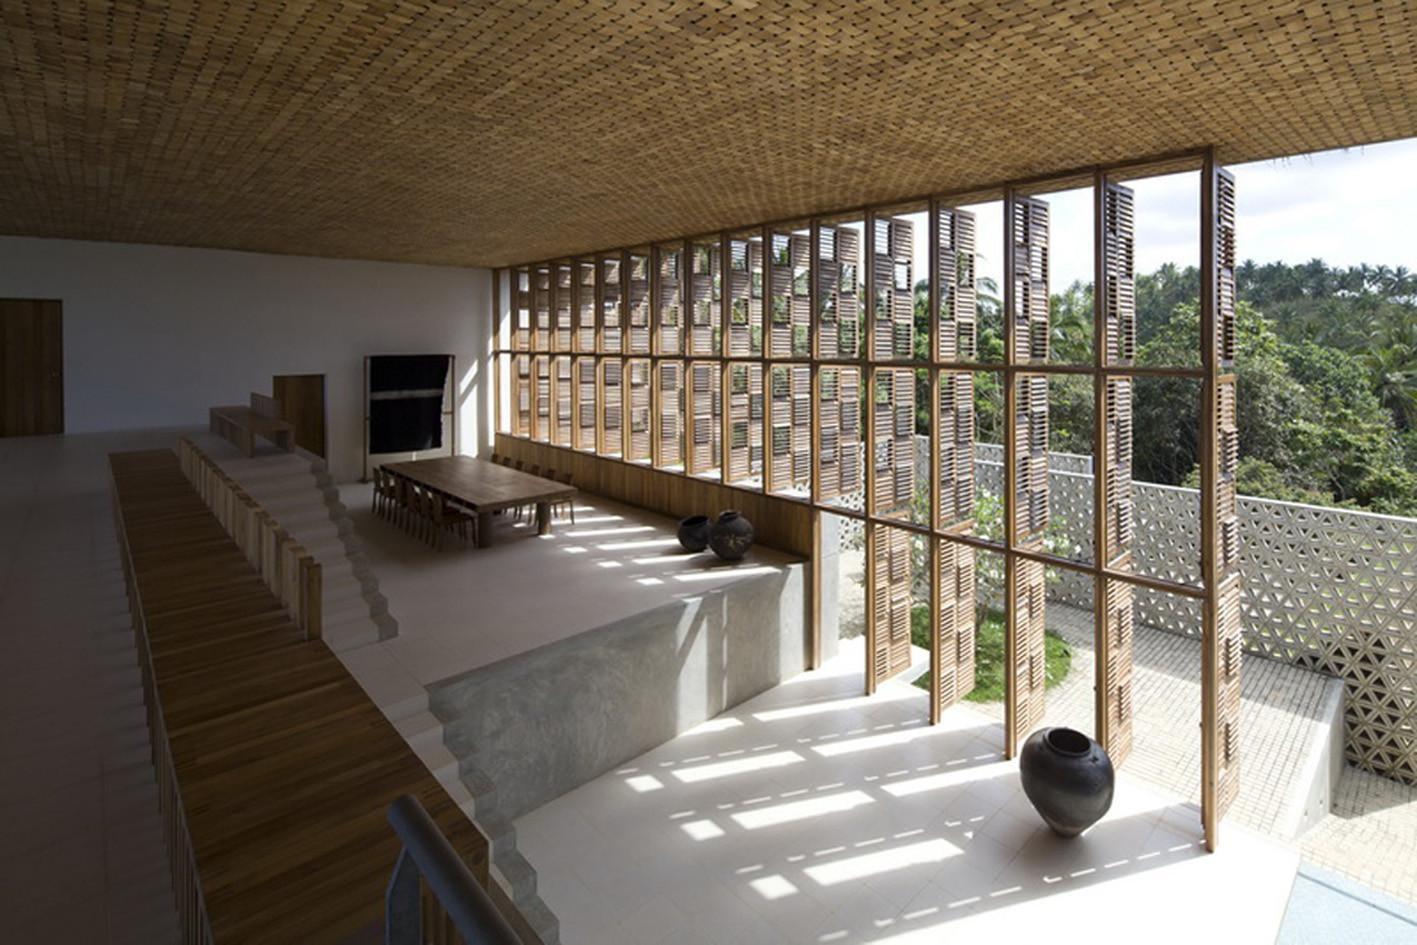 Ideada por el estudio Shigeru Ban Architects